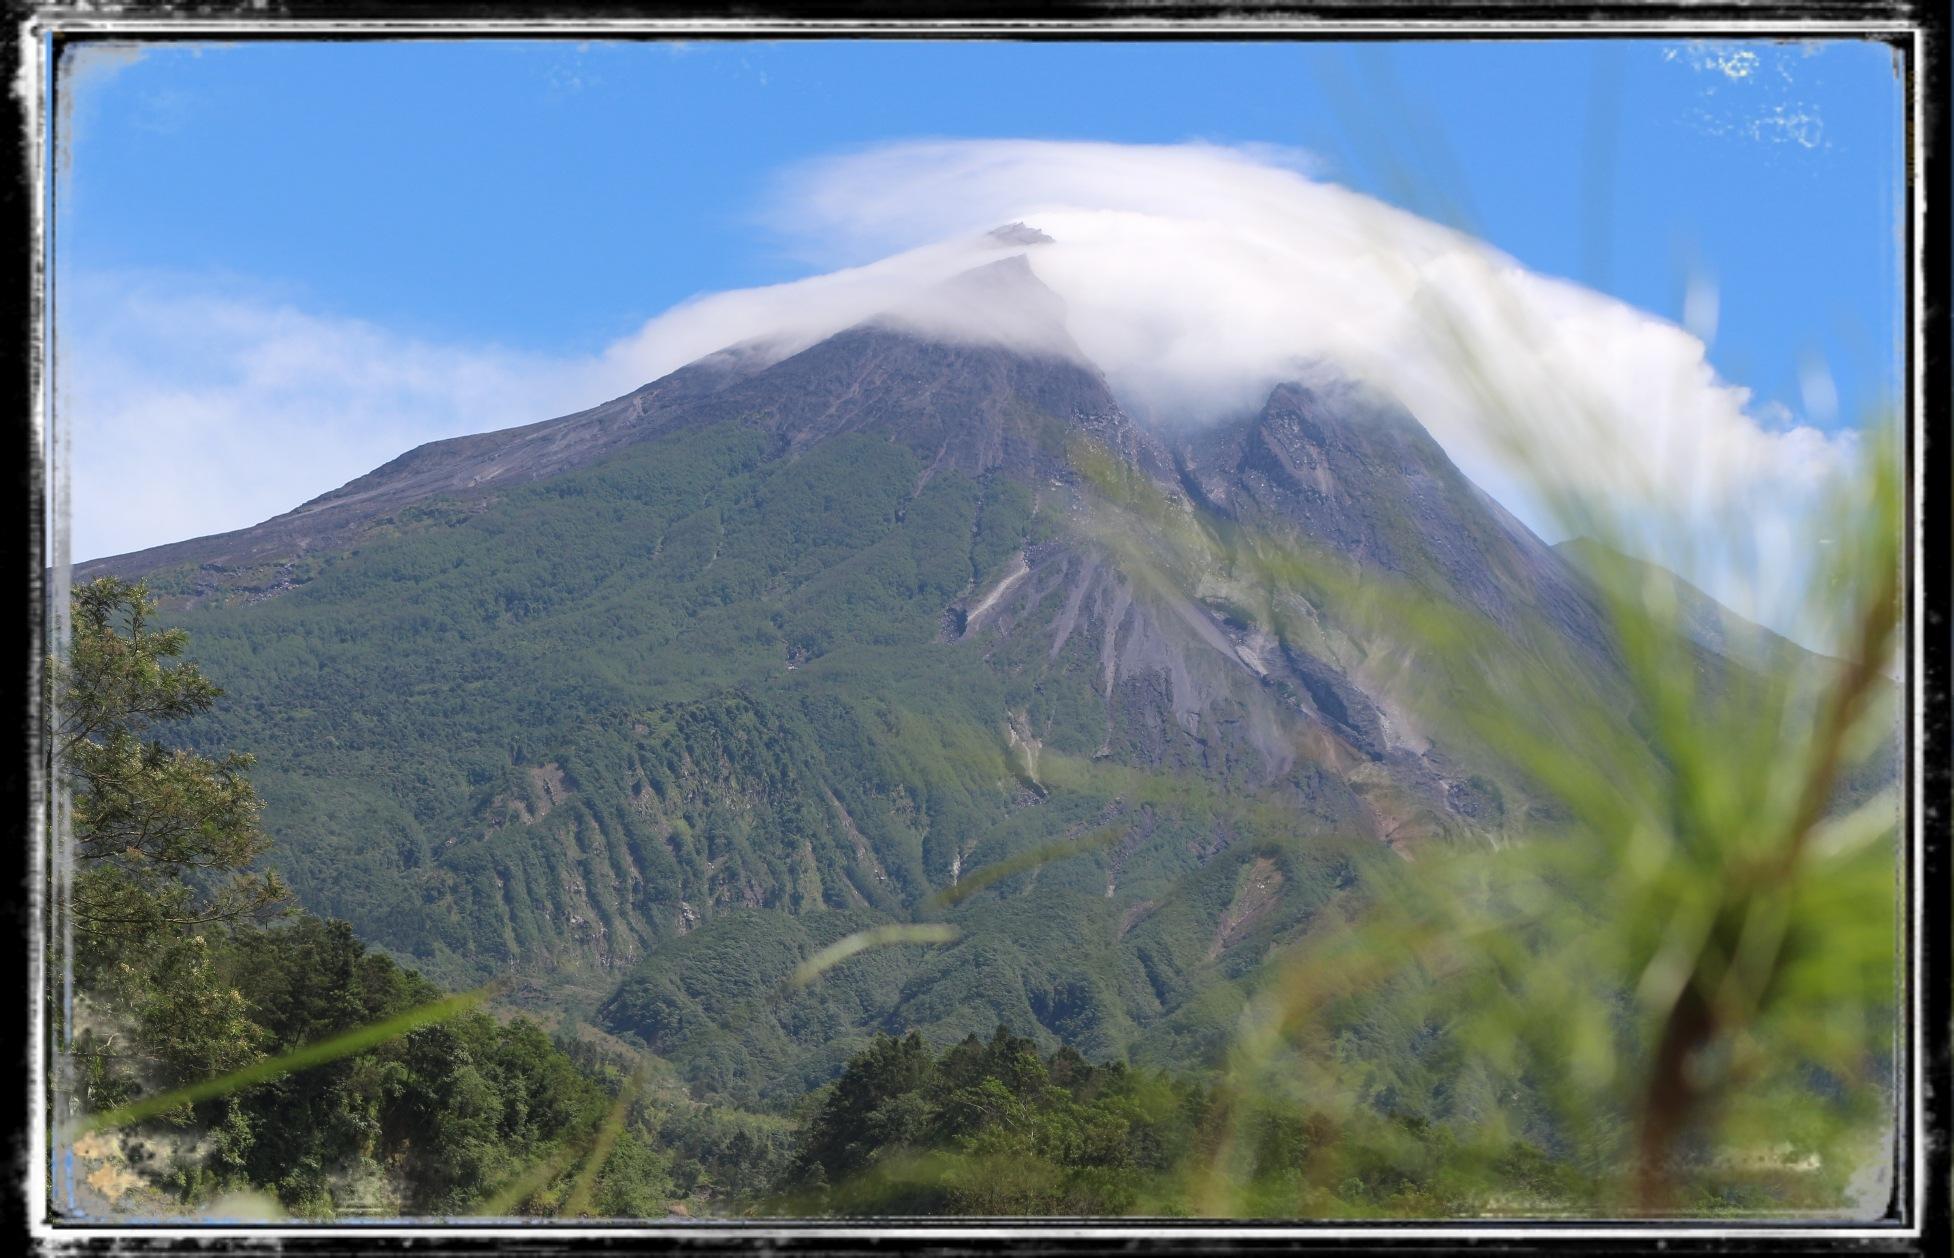 Mountain by Diana Nita